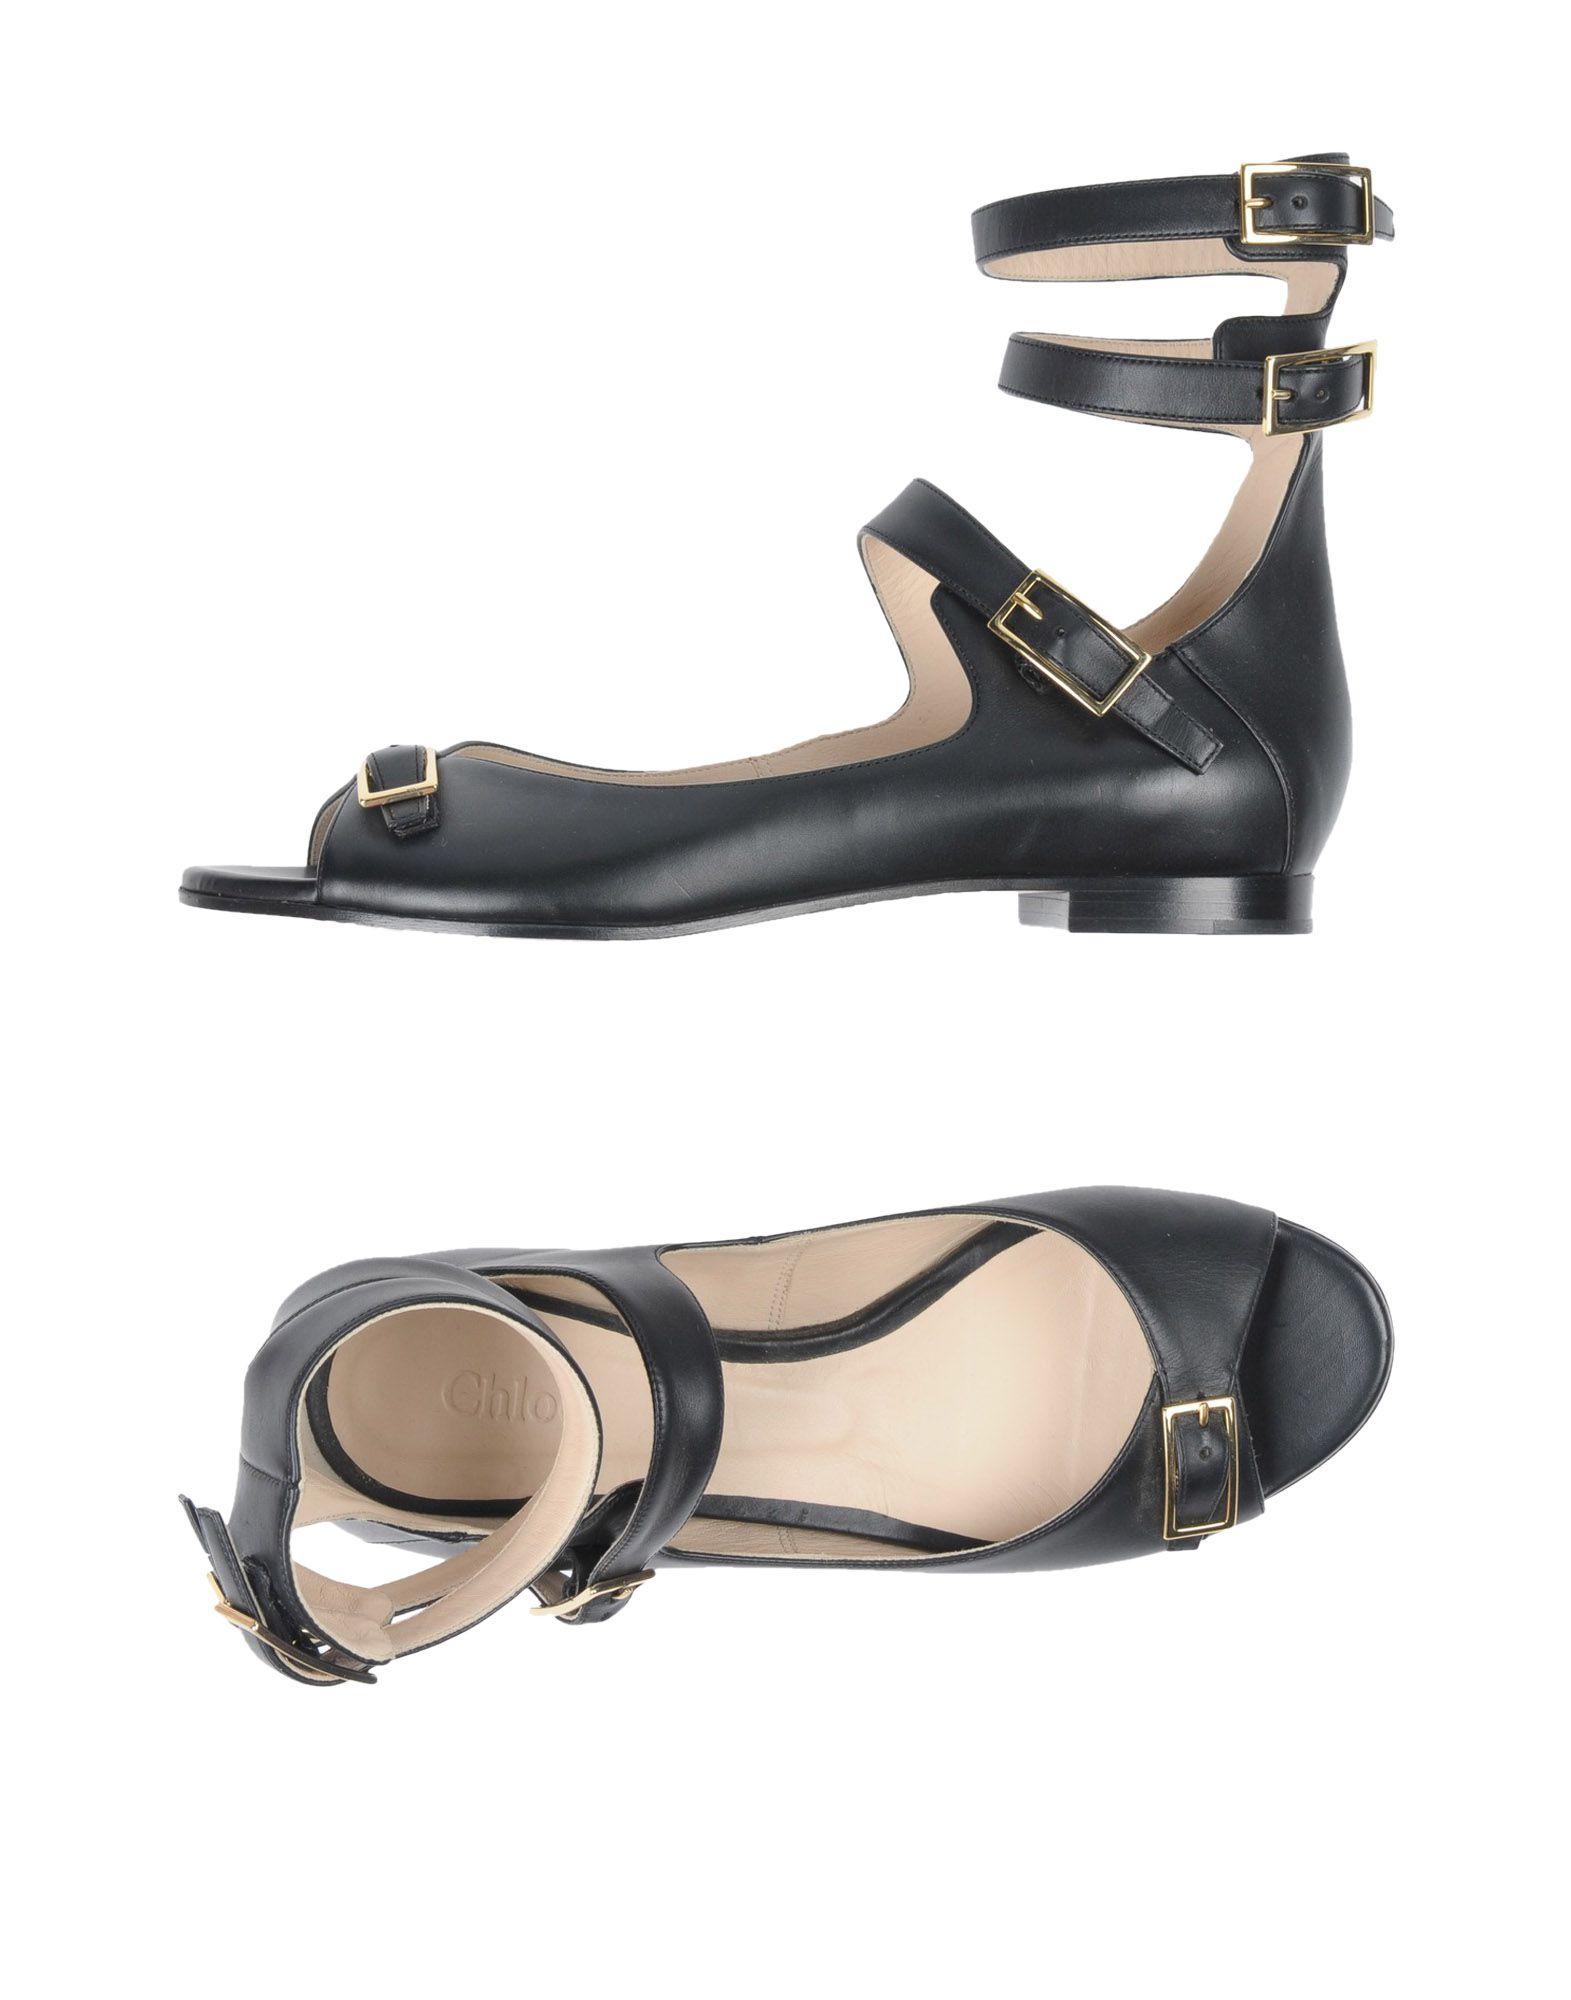 Chloé Ballerinas Damen  11308282TWGut Schuhe aussehende strapazierfähige Schuhe 11308282TWGut 804947